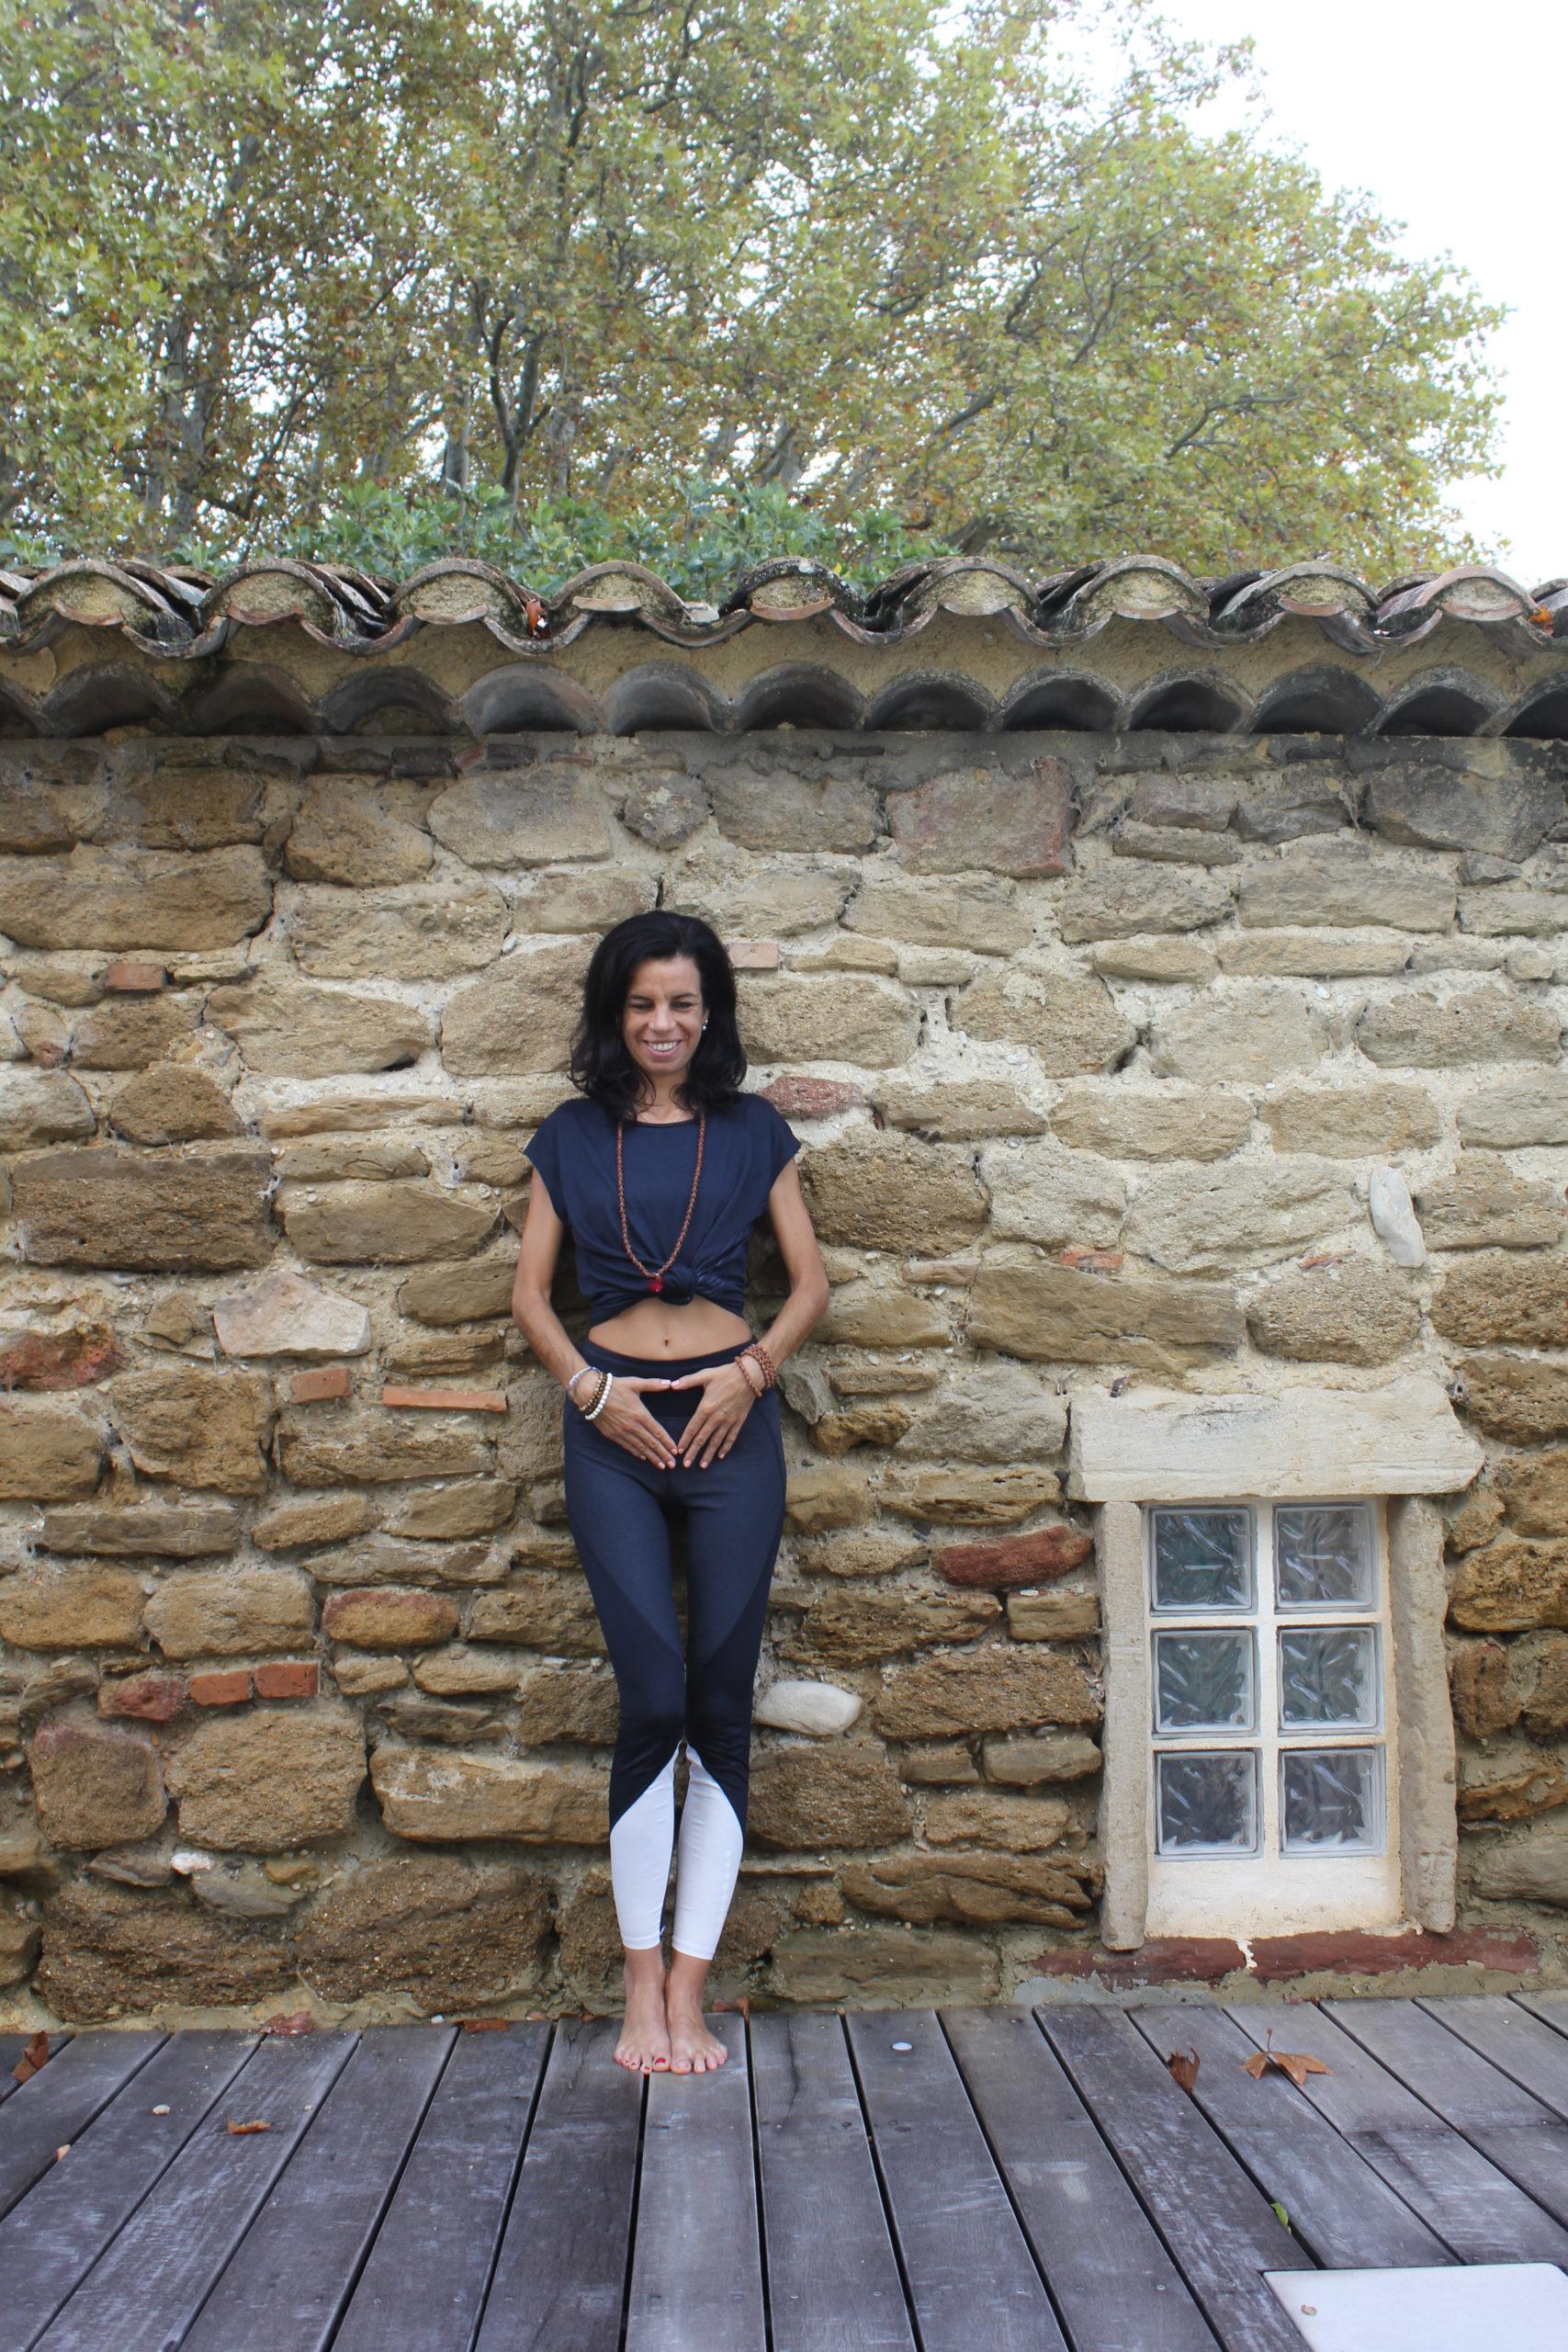 Naila Chbib